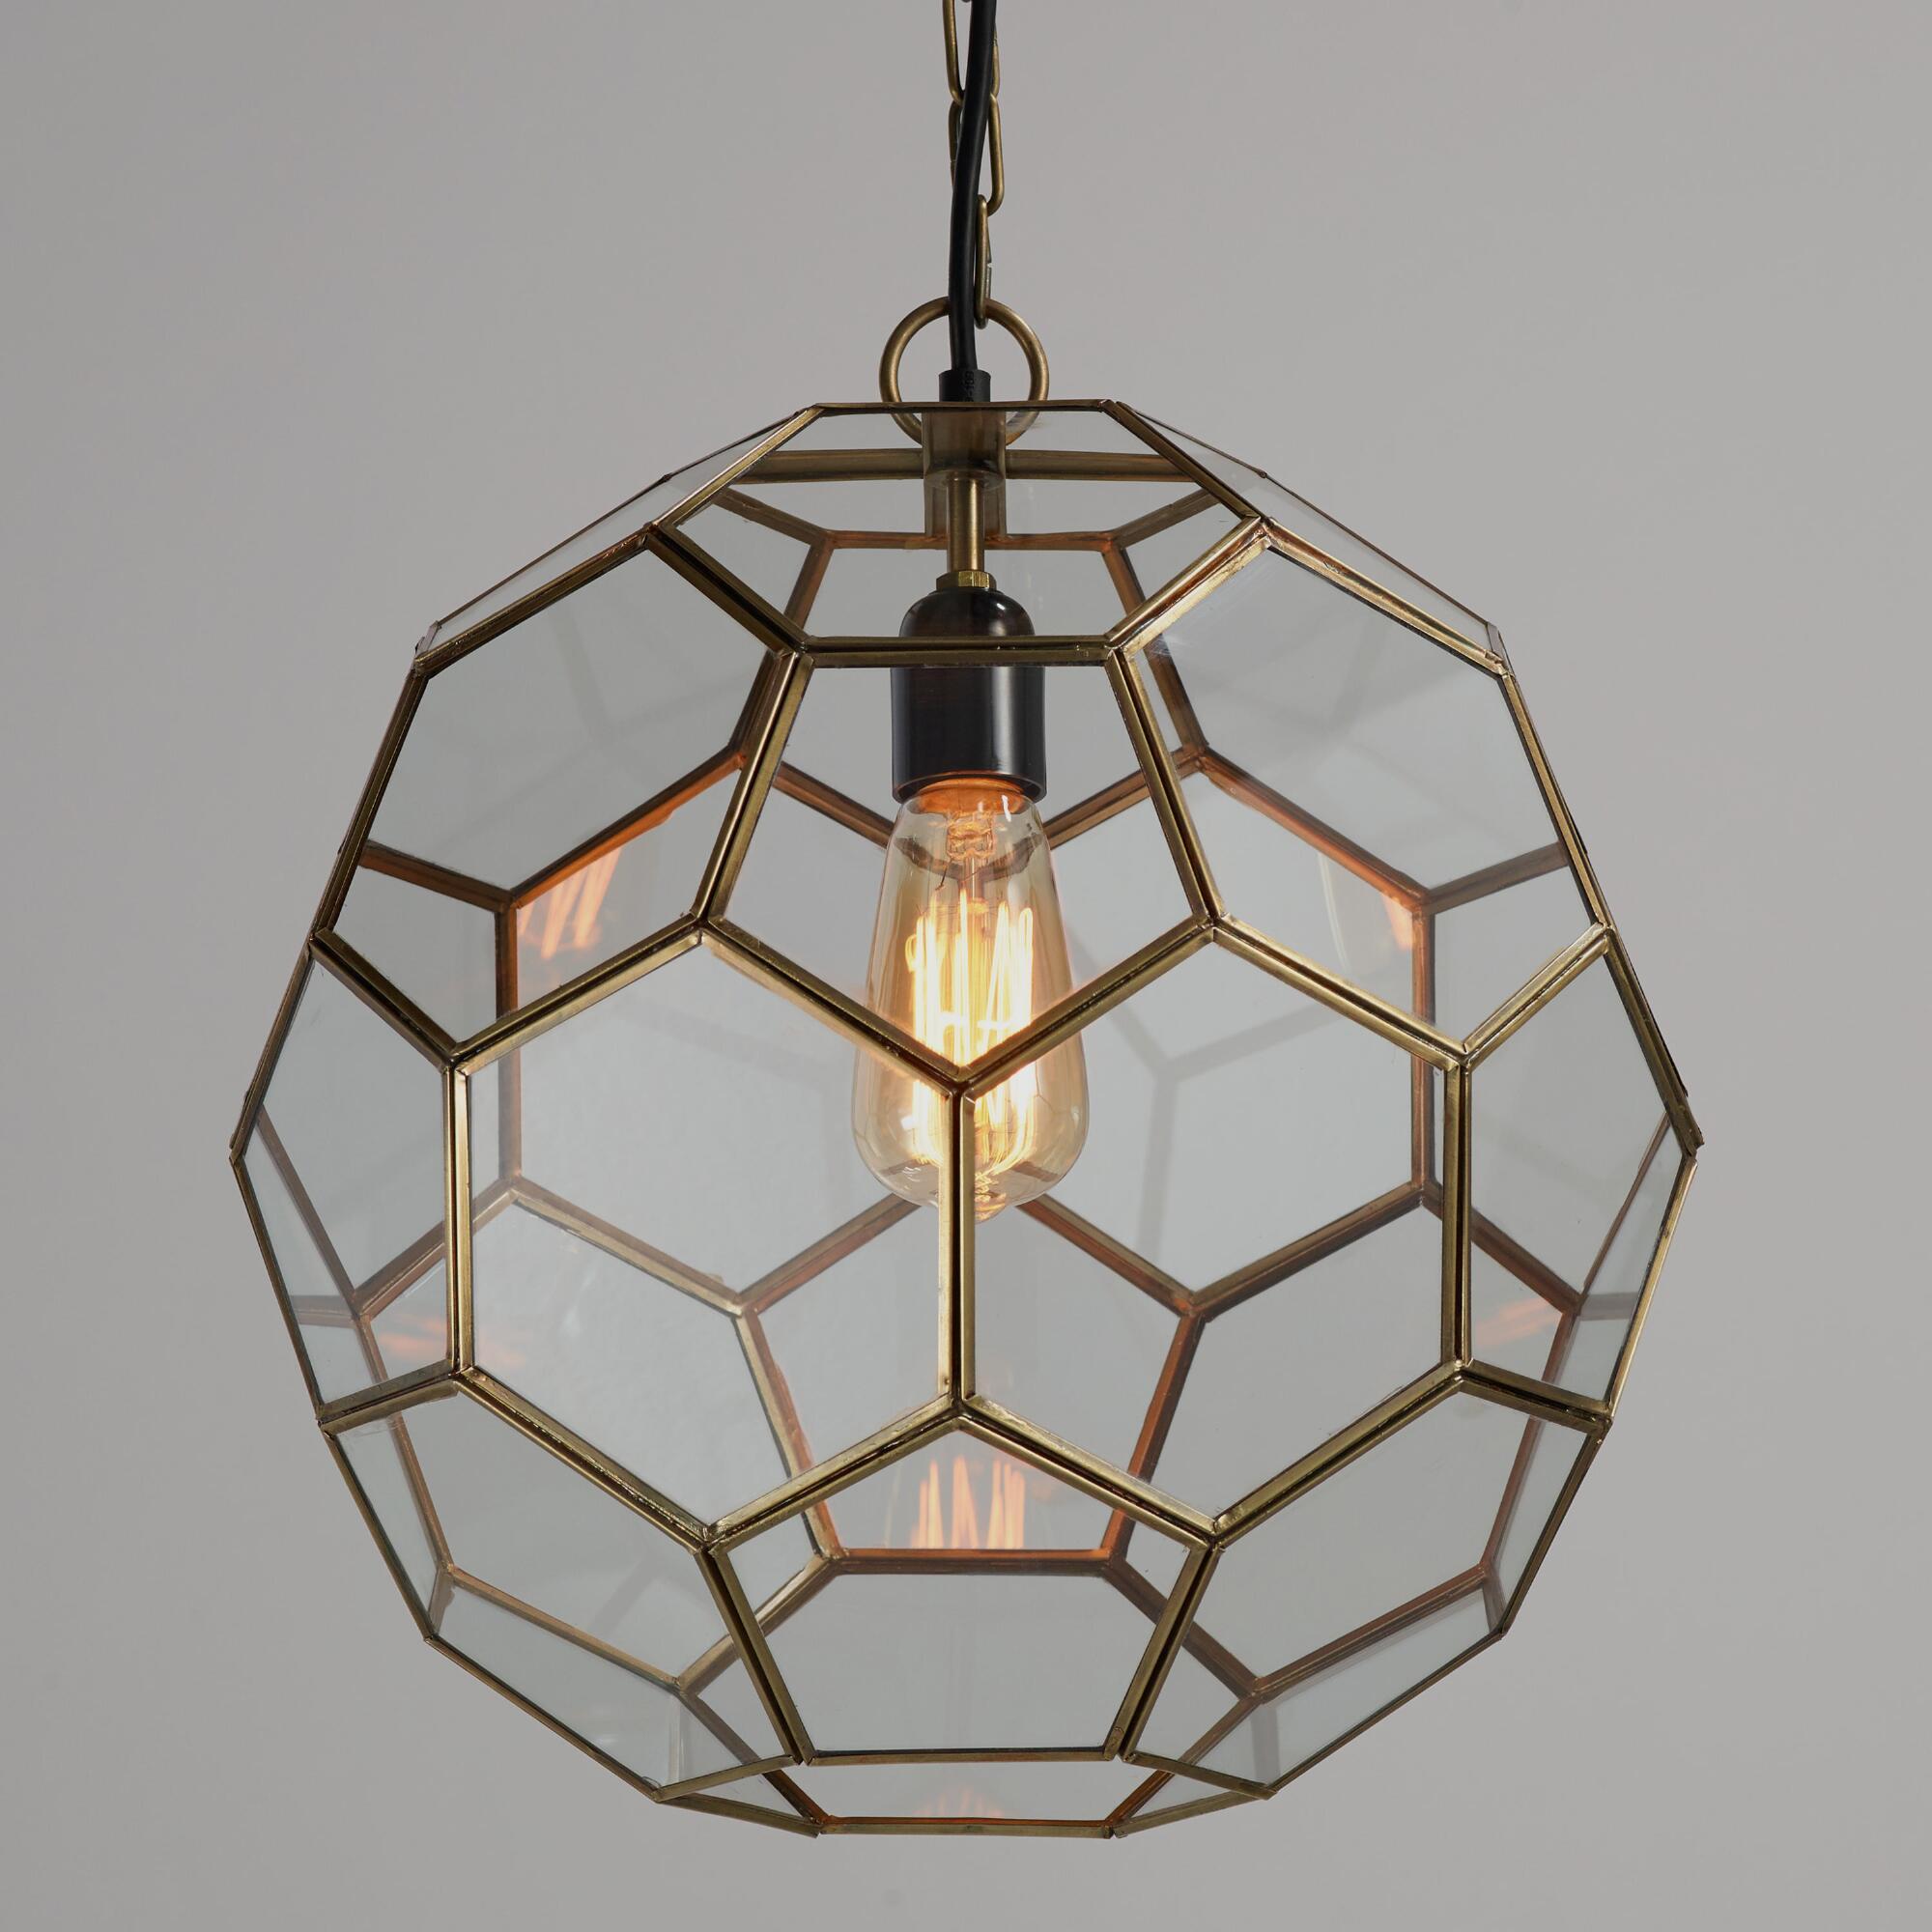 lighting-facetedglass.jpg